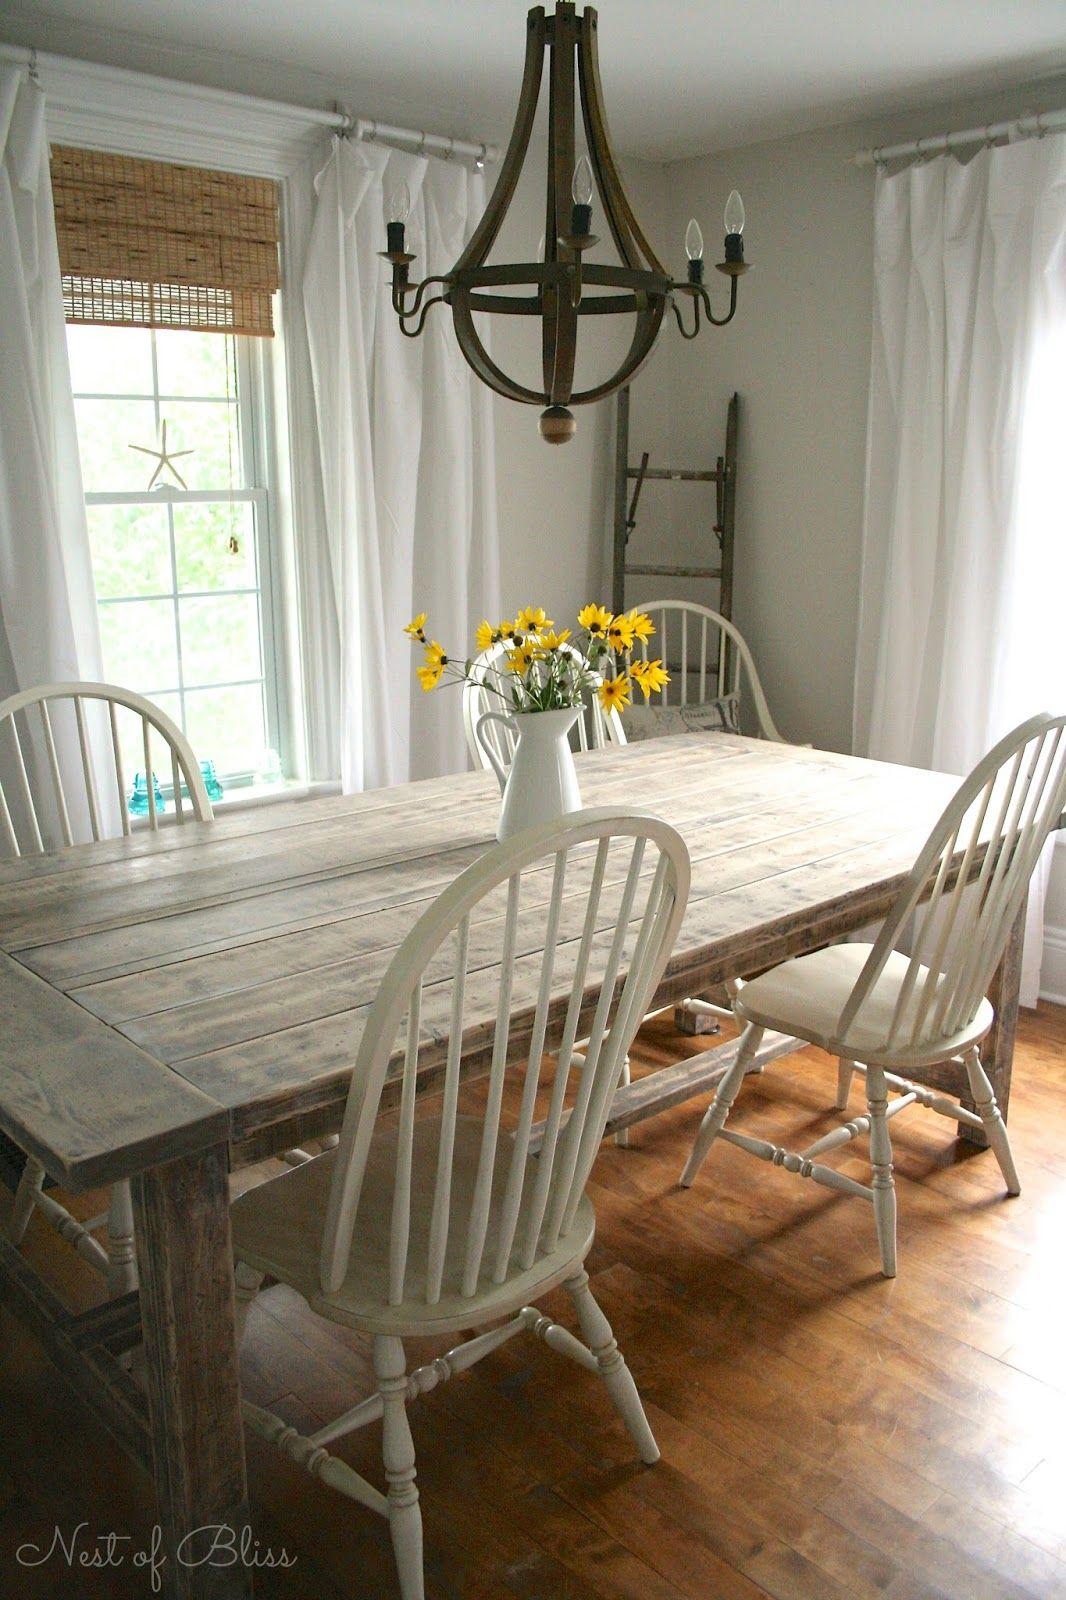 Diy Farmhouse Table  Furniture  Pinterest  Diy Farmhouse Table Captivating Diy Dining Room Table Makeover Decorating Inspiration